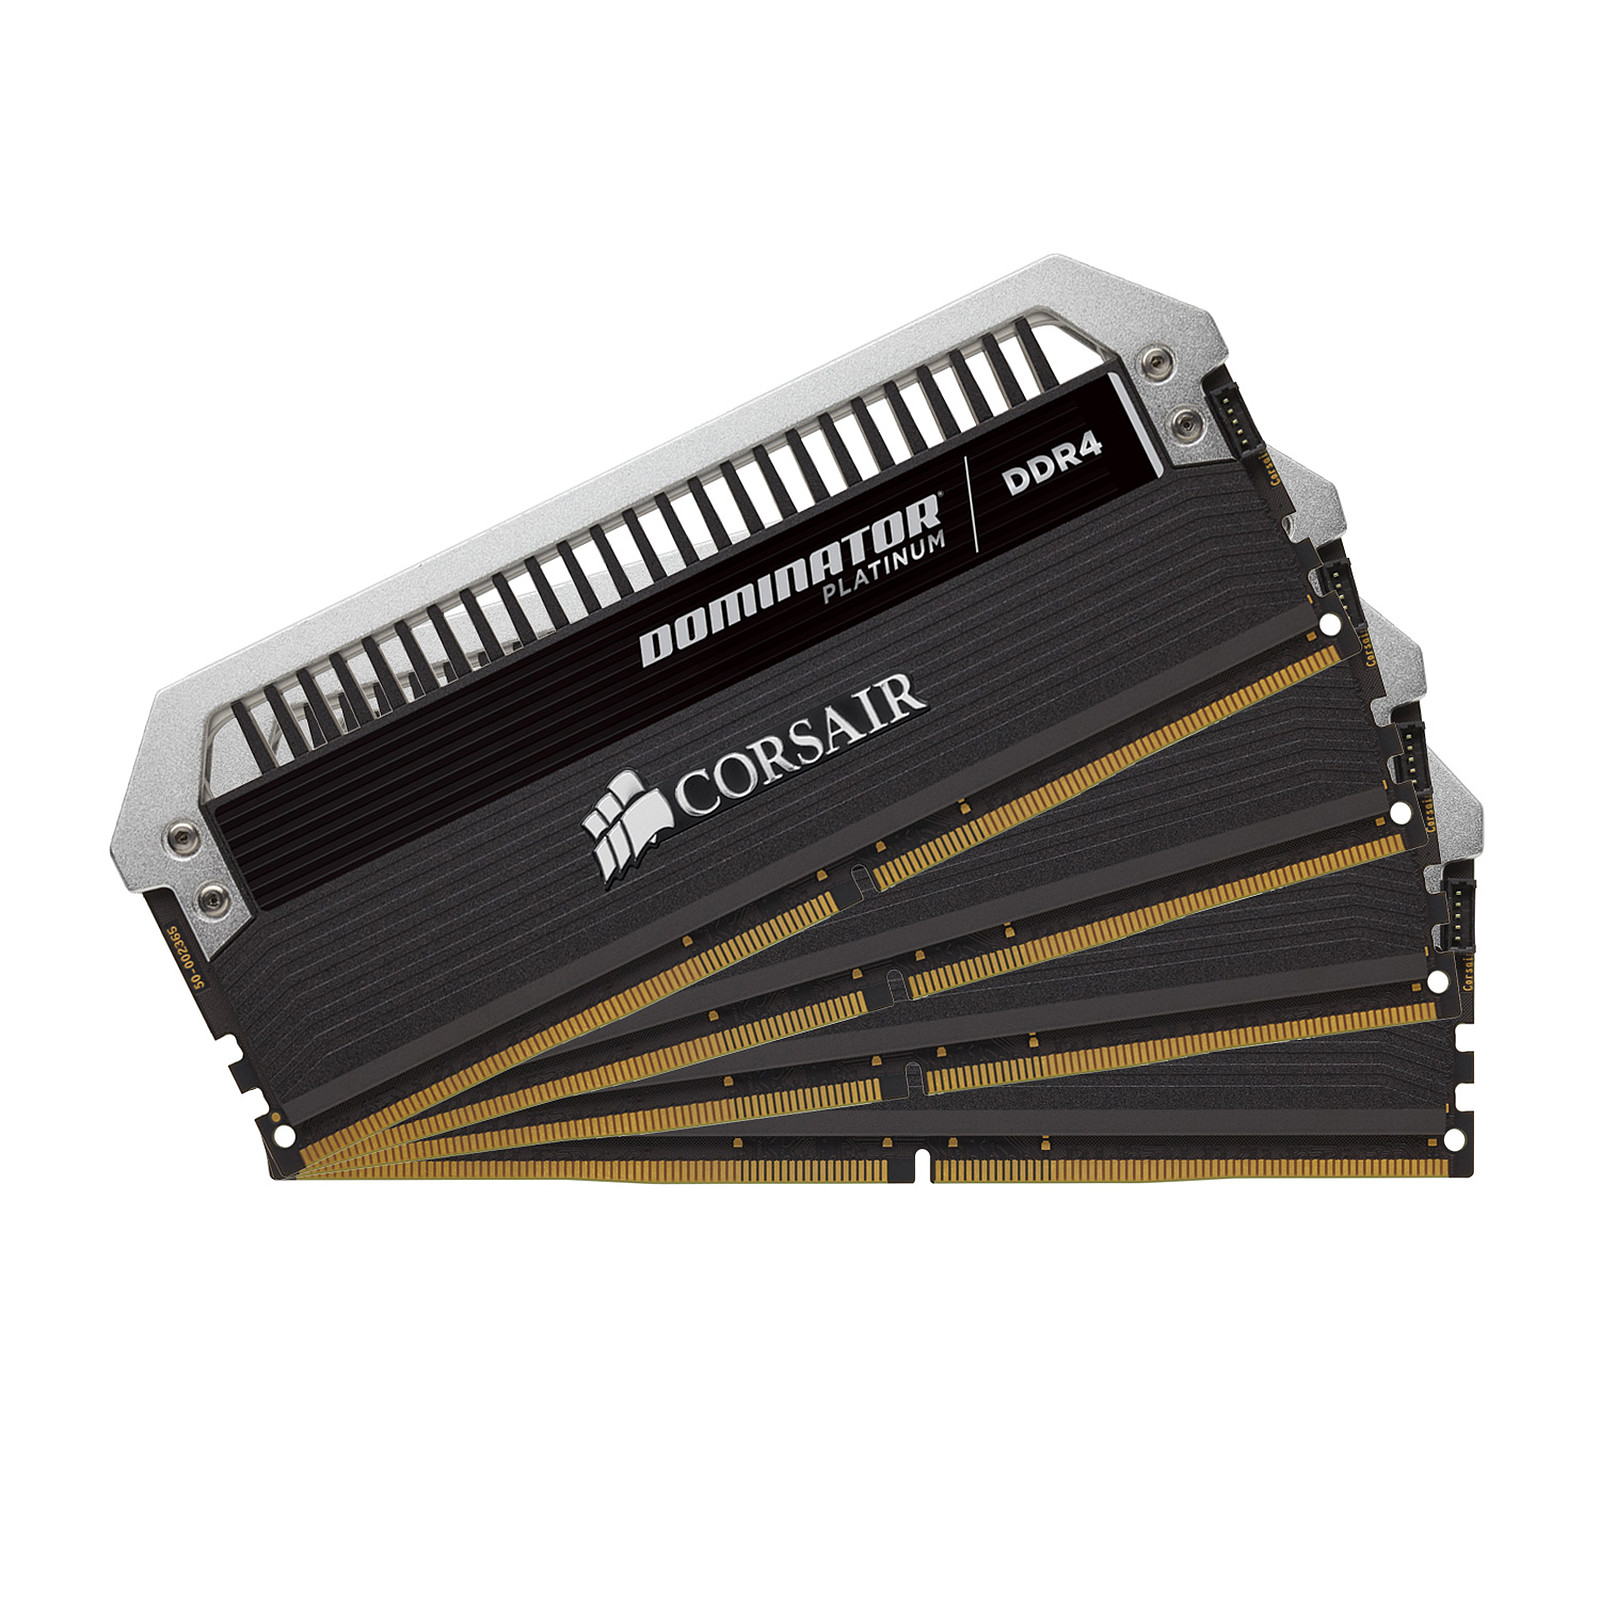 Corsair Dominator Platinum 32 Go (4x 8 Go) DDR4 4000 MHz CL19